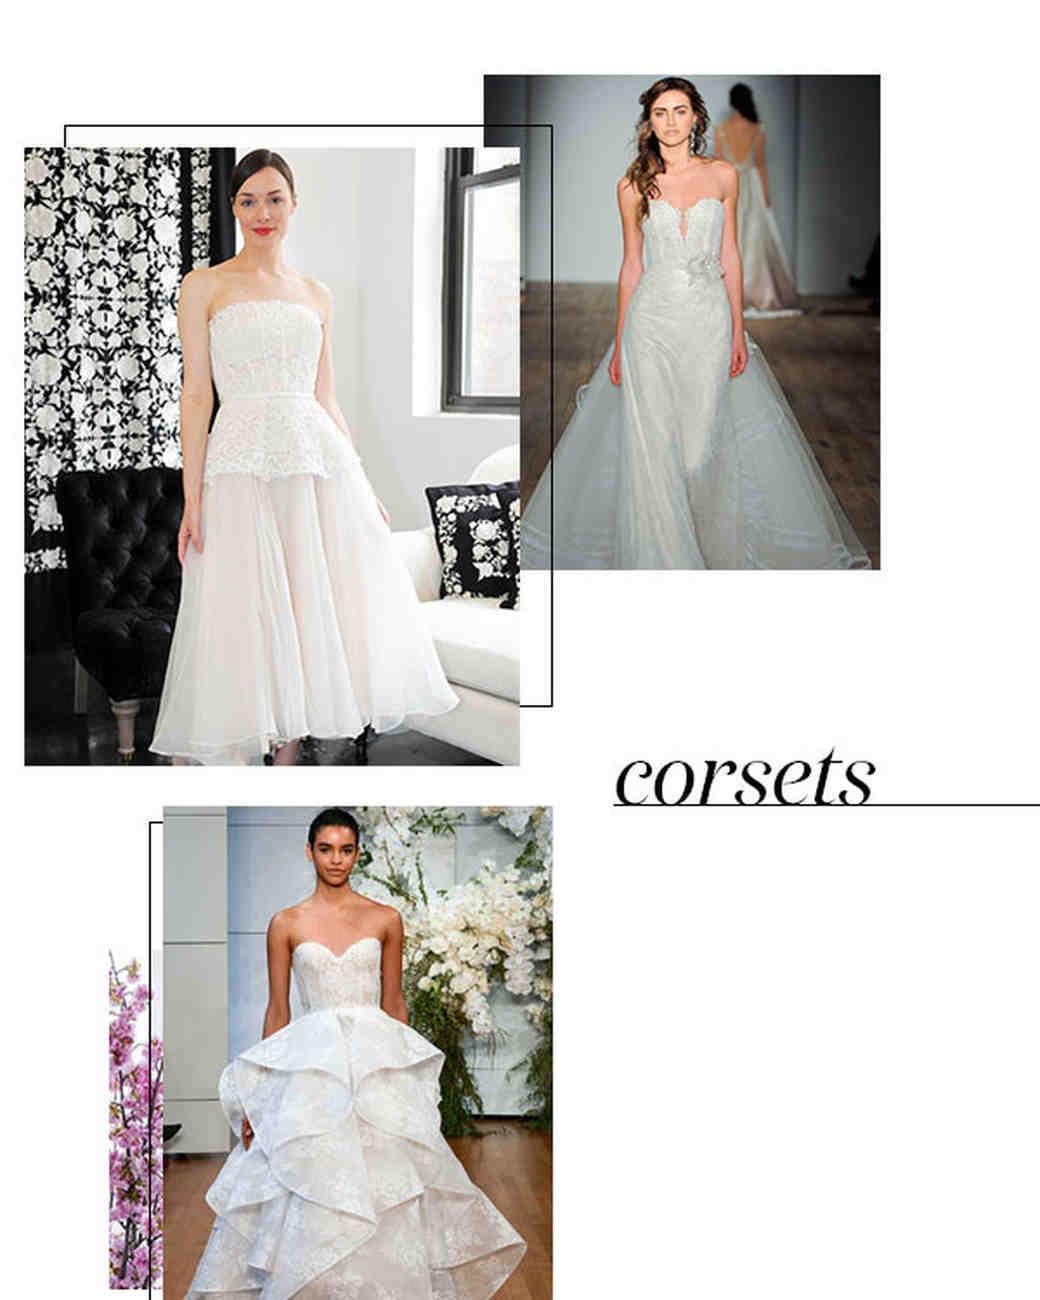 bridal-fashion-week-spring-2018-trends-corsets_vert.jpg